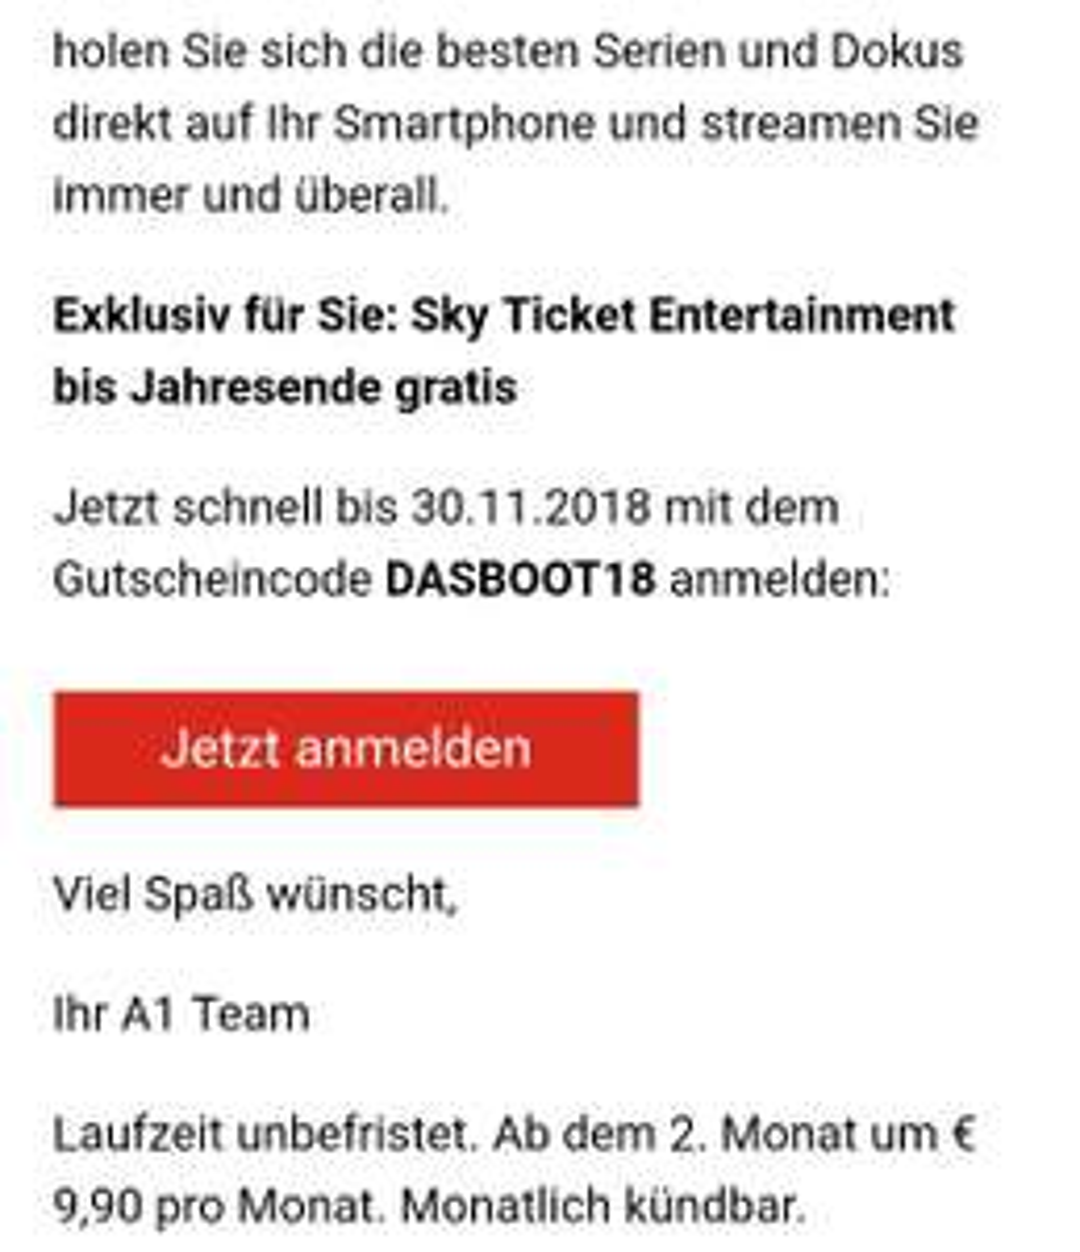 [SKY] 1 Monat Gratis Entertainment Ticket für alle A1 Mobile Kunden